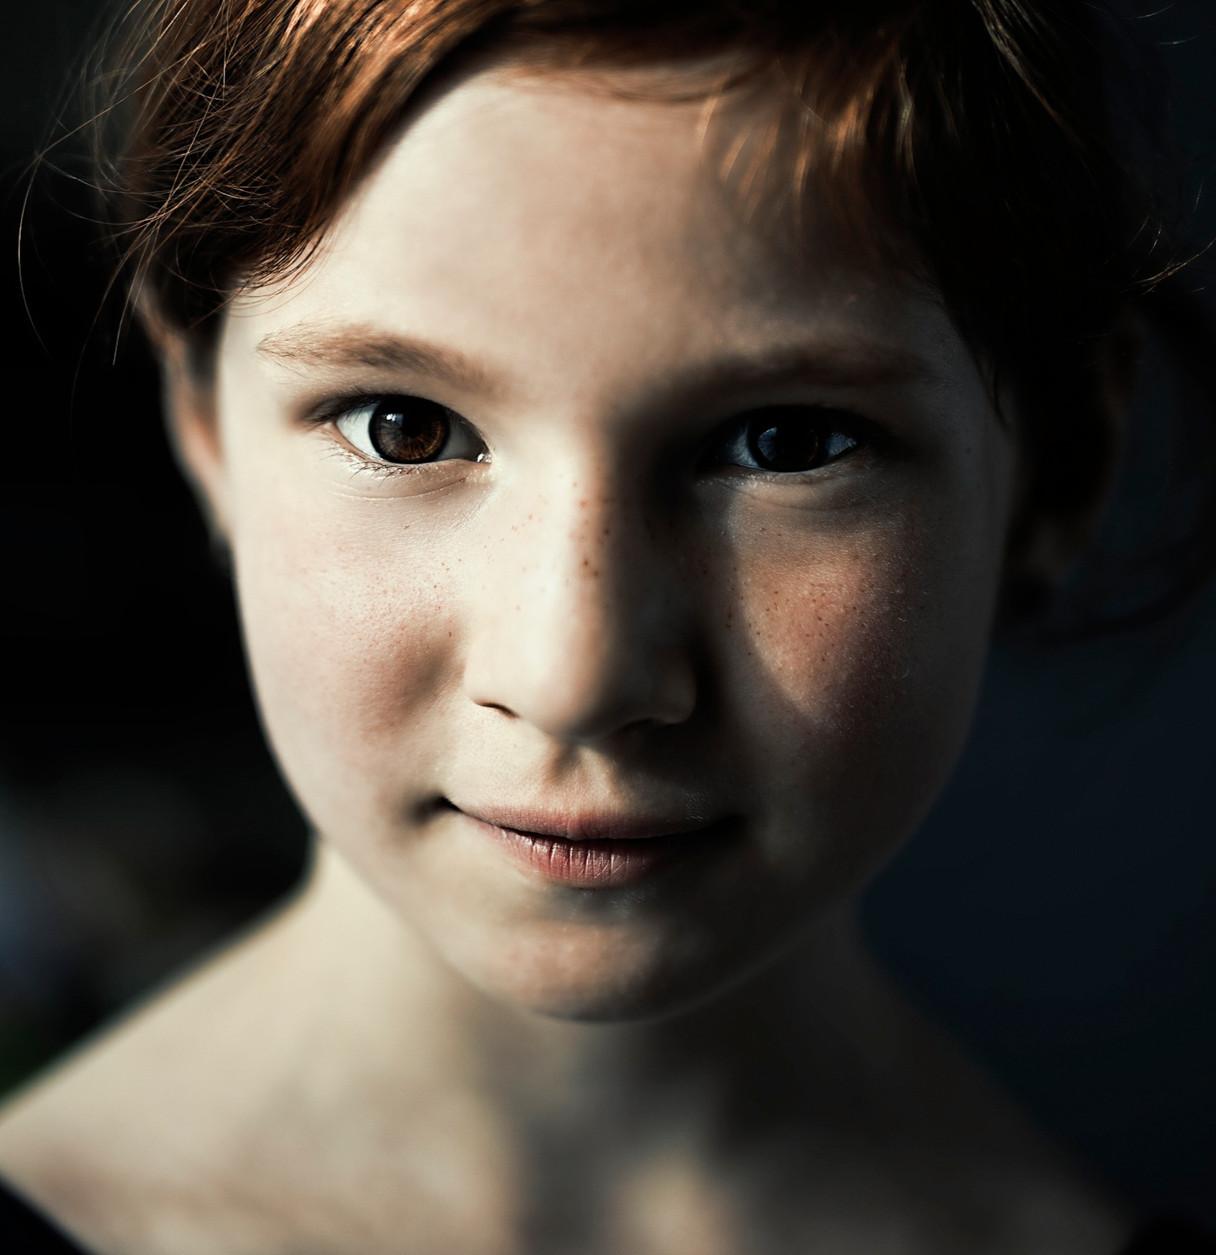 Levente Portrait Photography Berlin 14